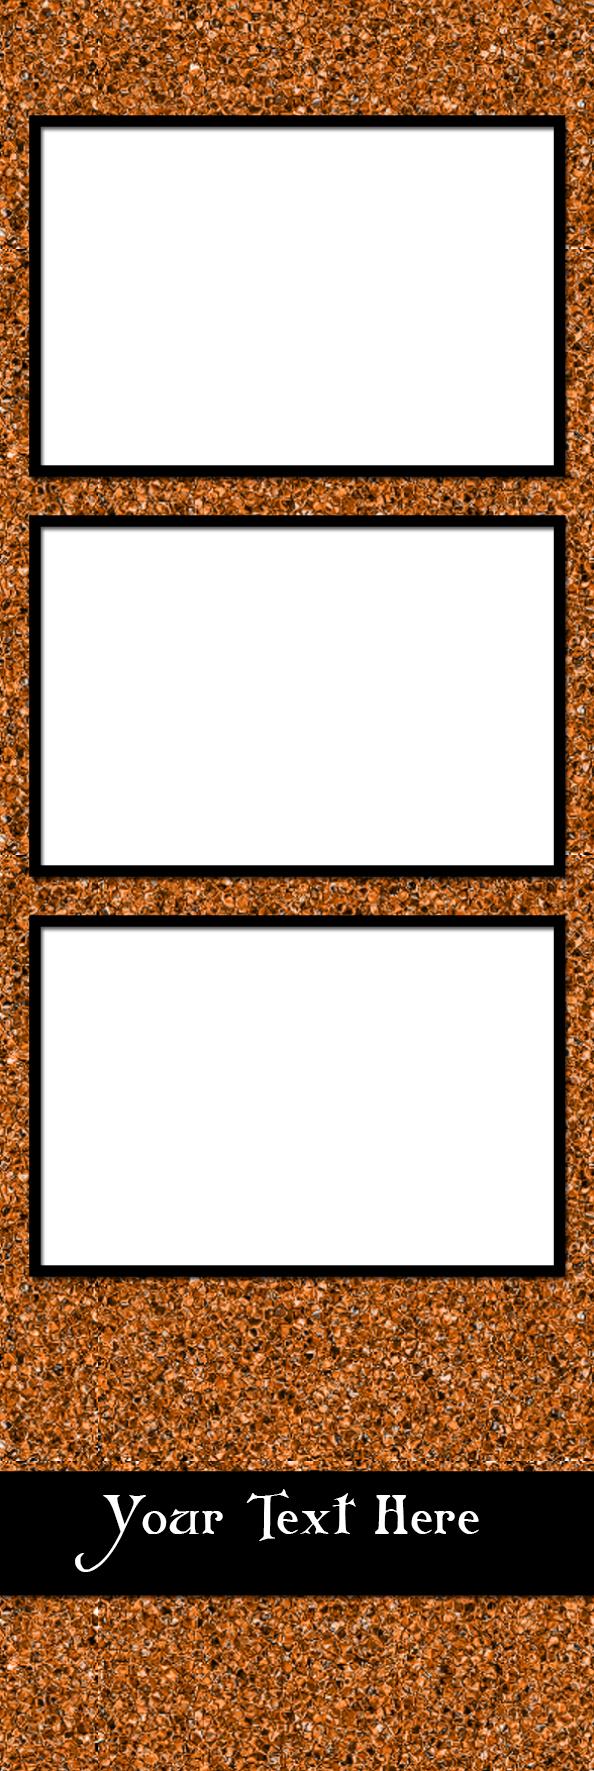 Texture_Glitter-V-6P3.jpg